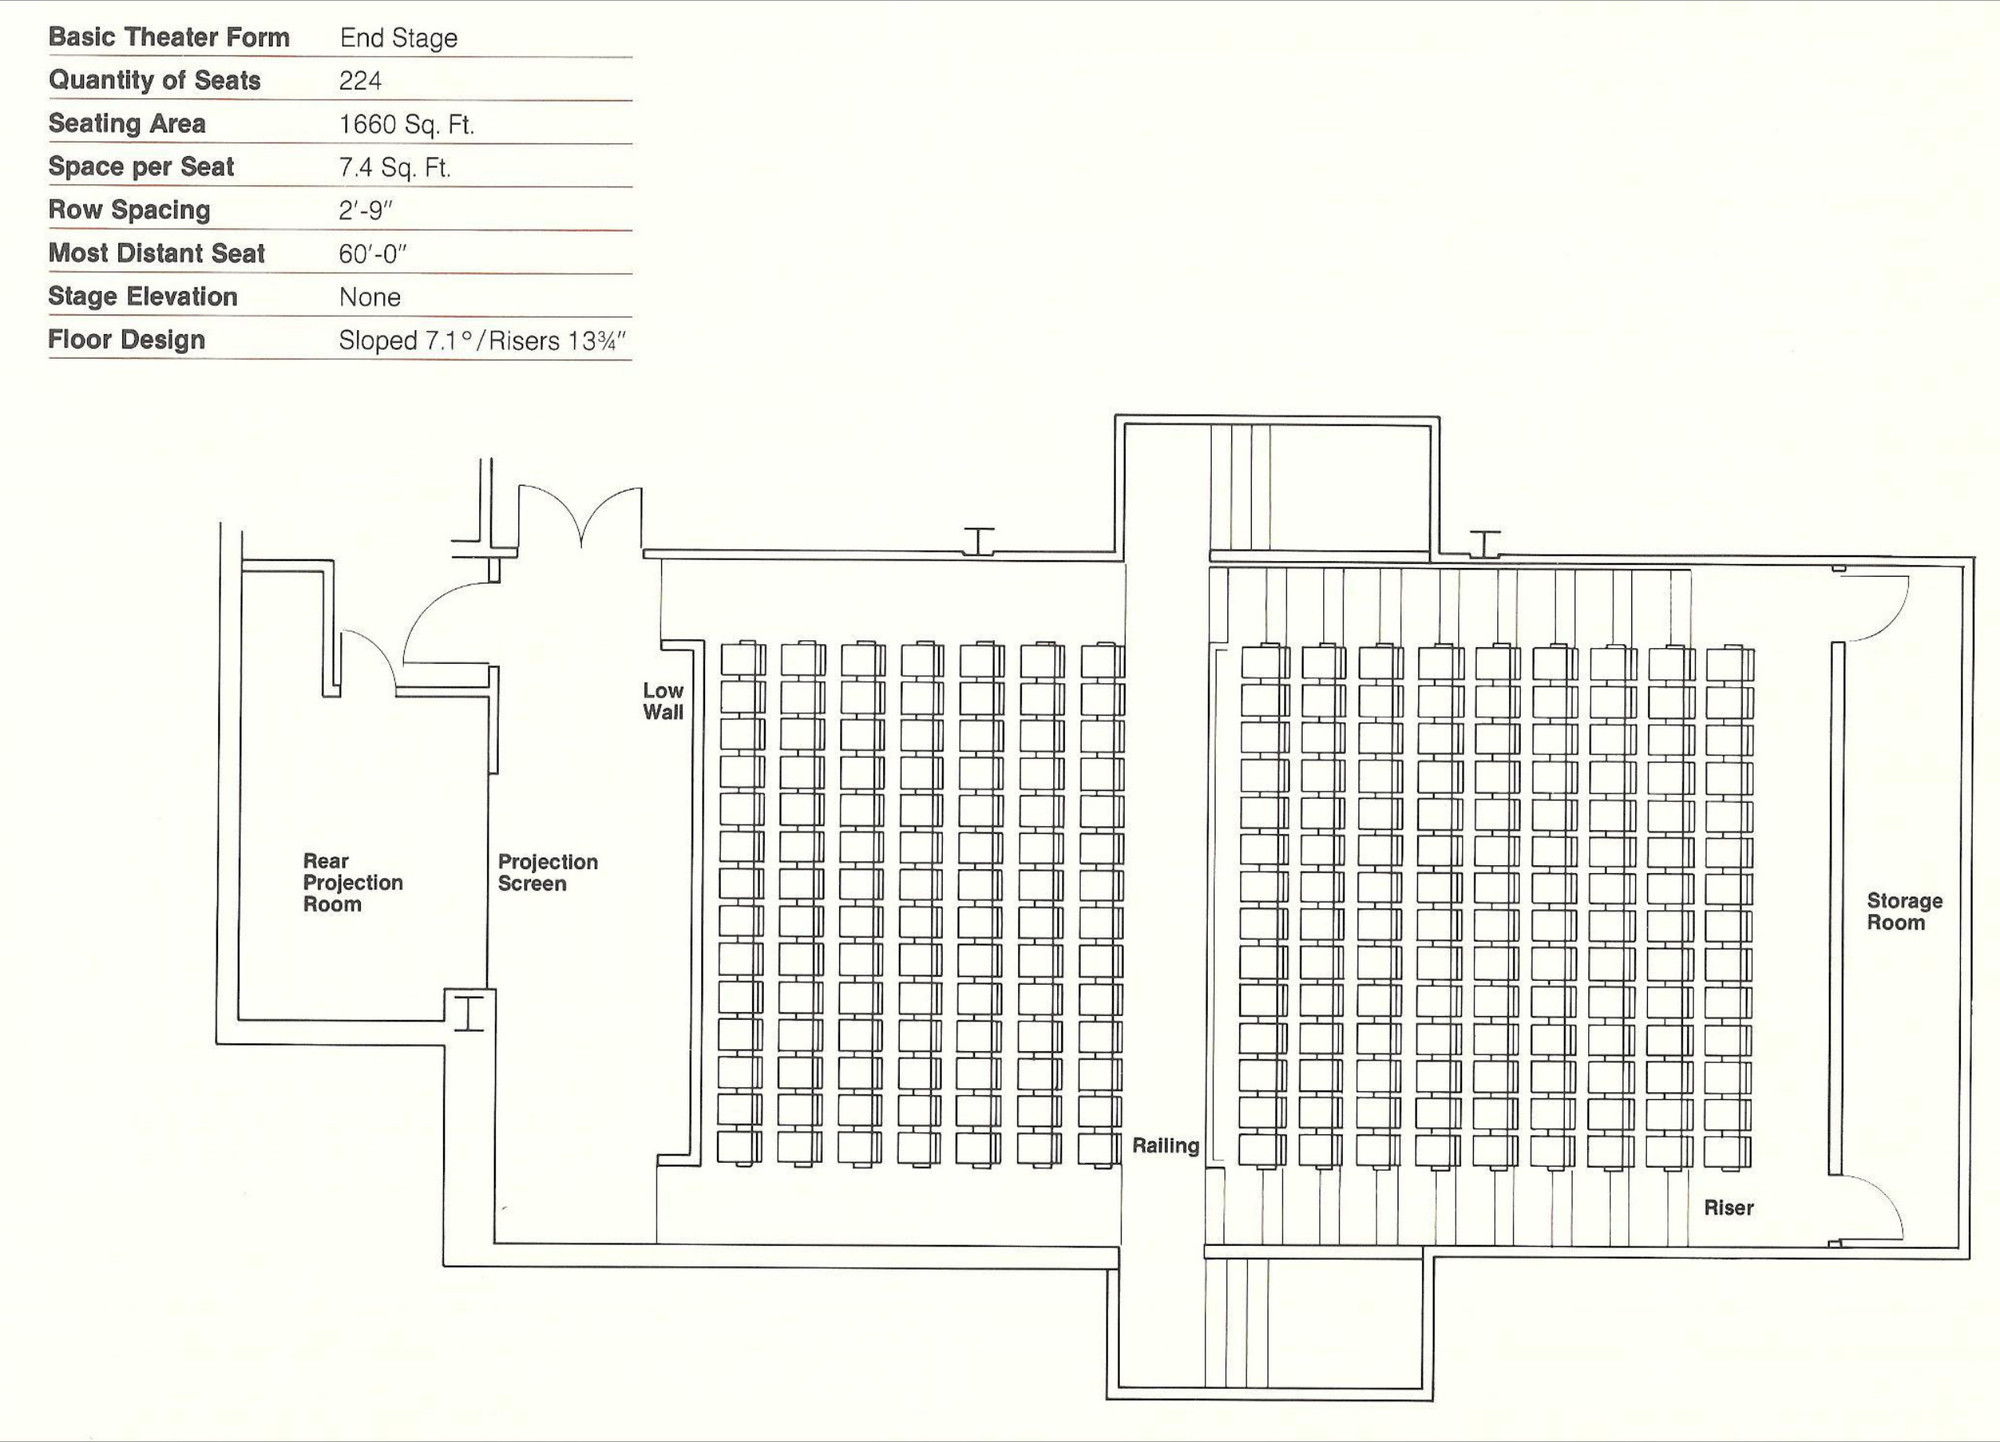 top level block diagram setup